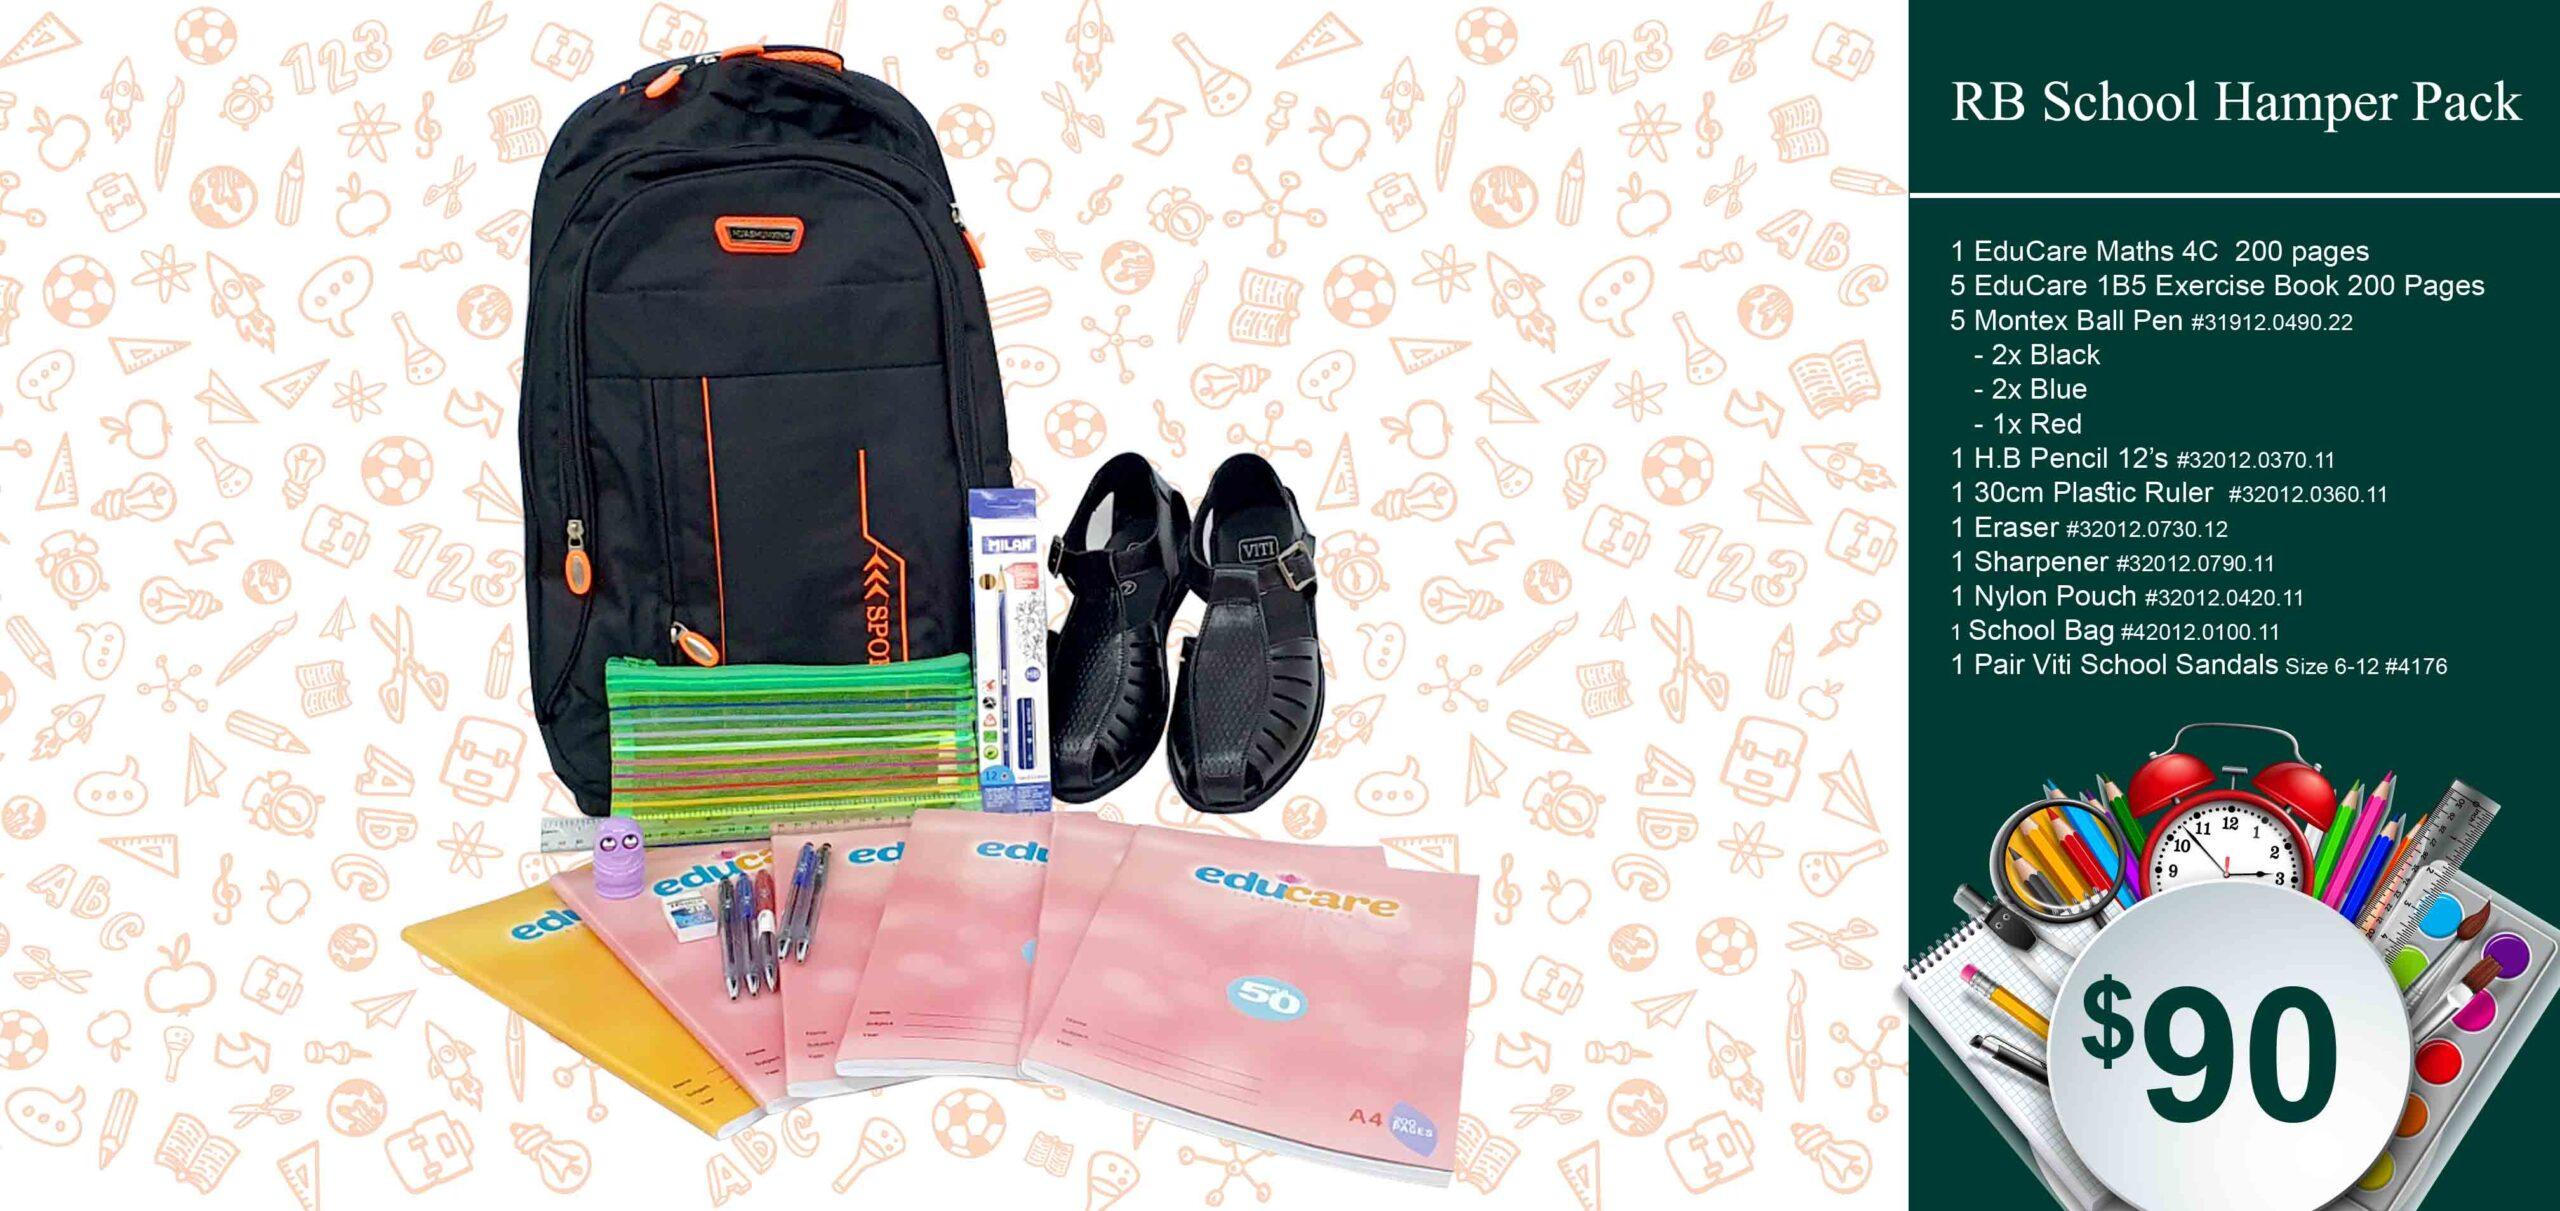 RB School Hamper Pack $90